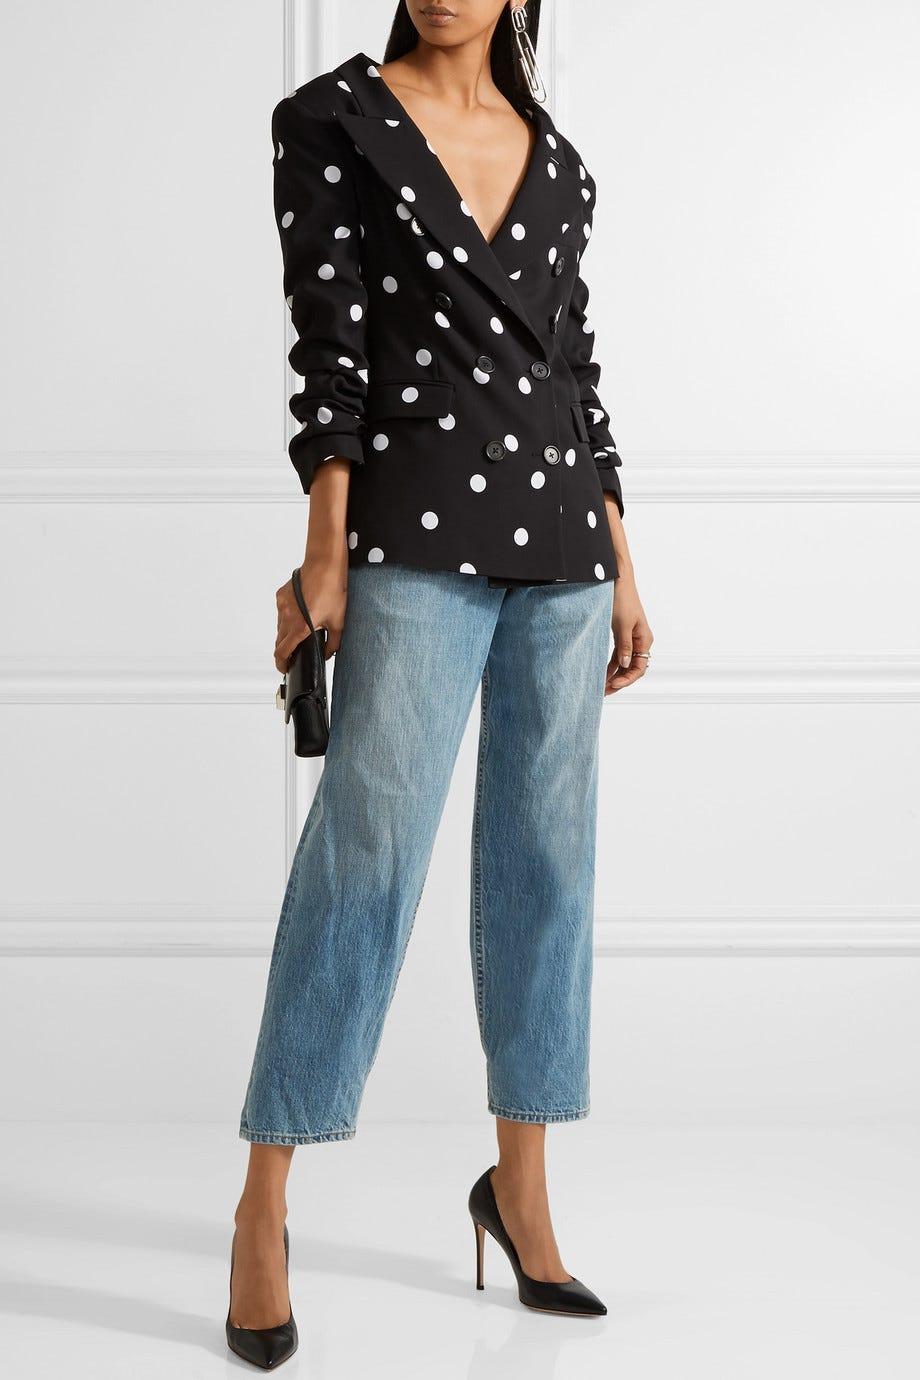 7937d0eb4b Cute Ways To Wear The Polka Dot Trend Winter 2018